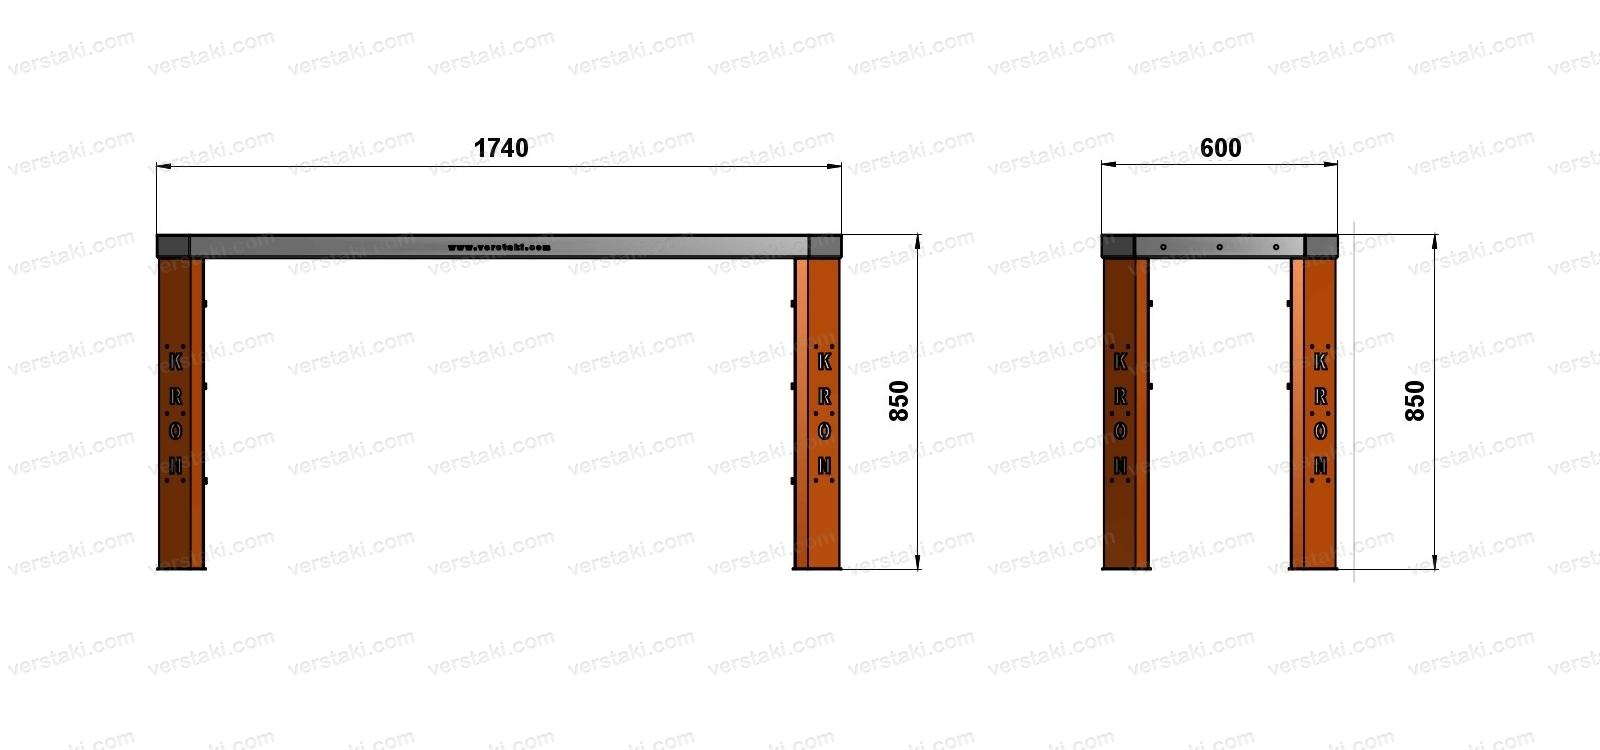 Чертеж слесарного верстака шириной 1740 мм без экрана